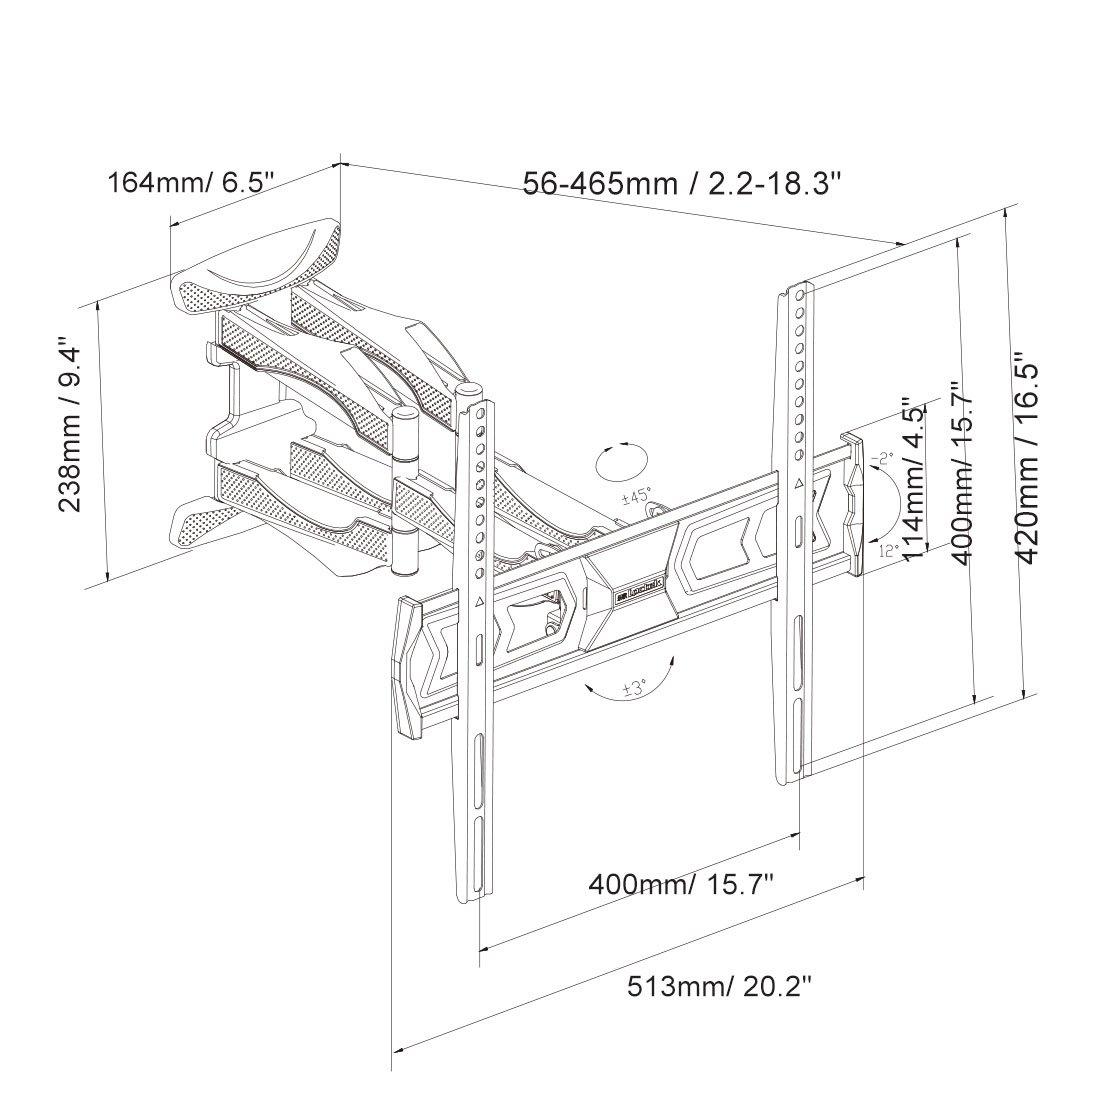 Fleximounts Arm 32-60 inch TV LCD Monitor Wall Mount, Full Motion Tilt Swivel Flat Panel Screen with VESA 400x400mm